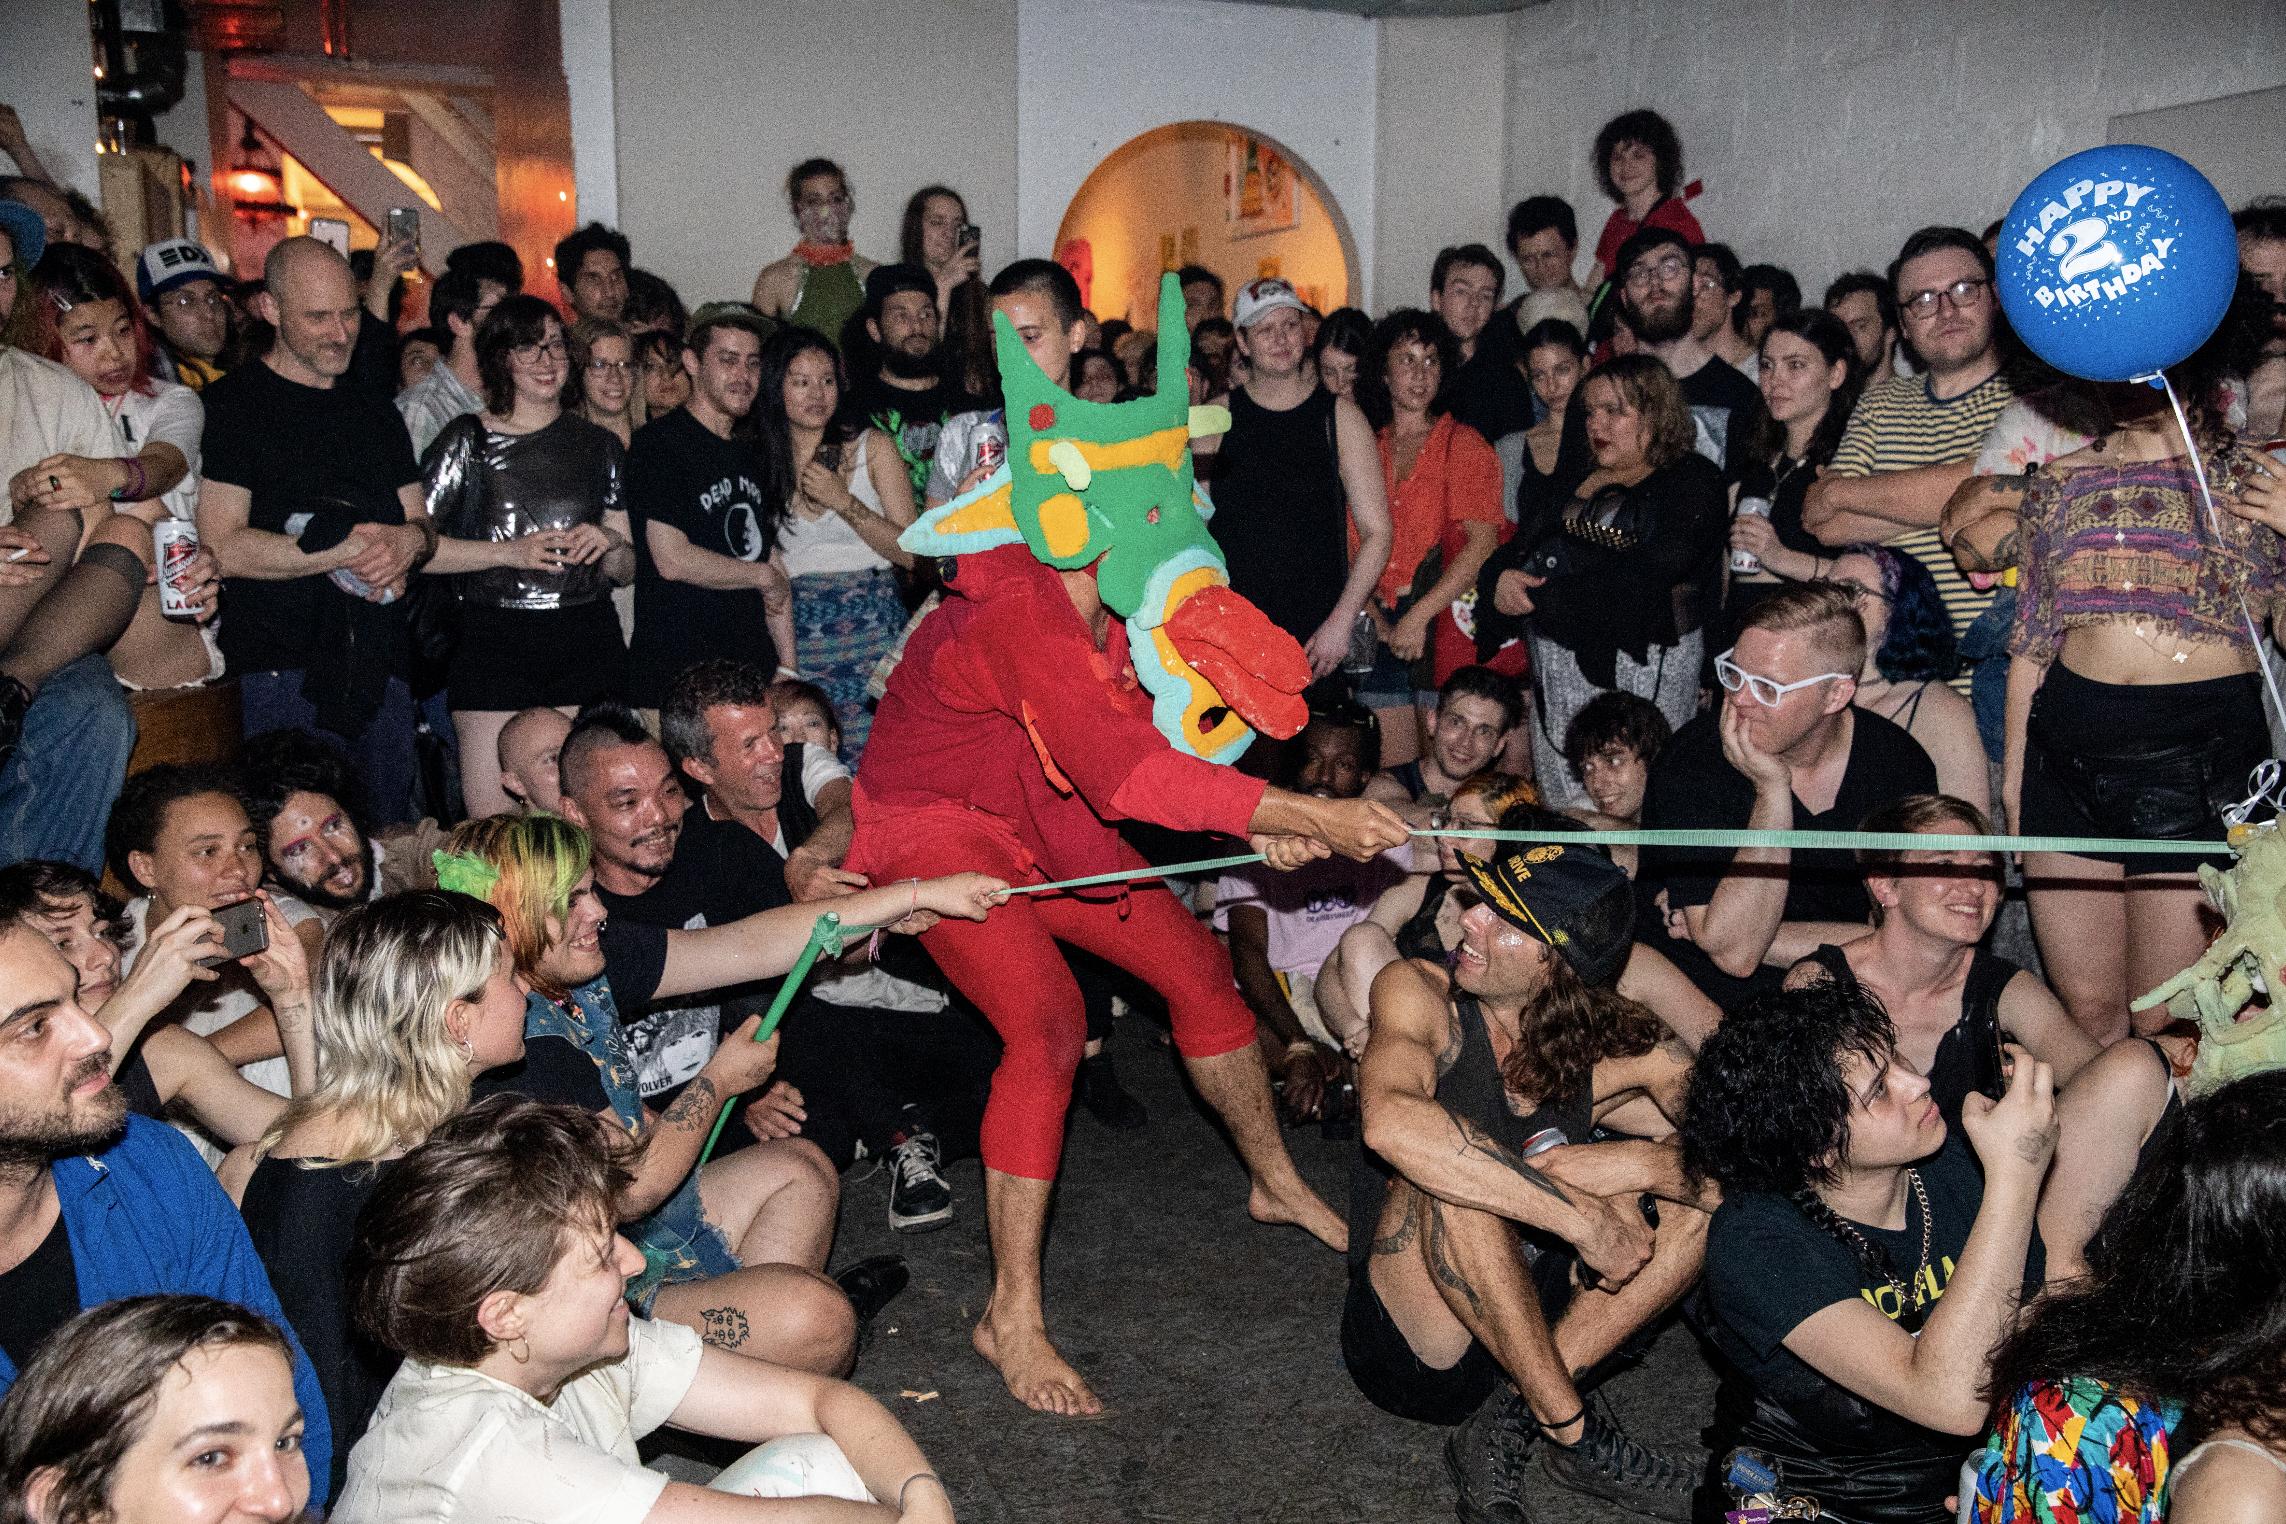 Poncili Creacion, Brooklyn, 2018